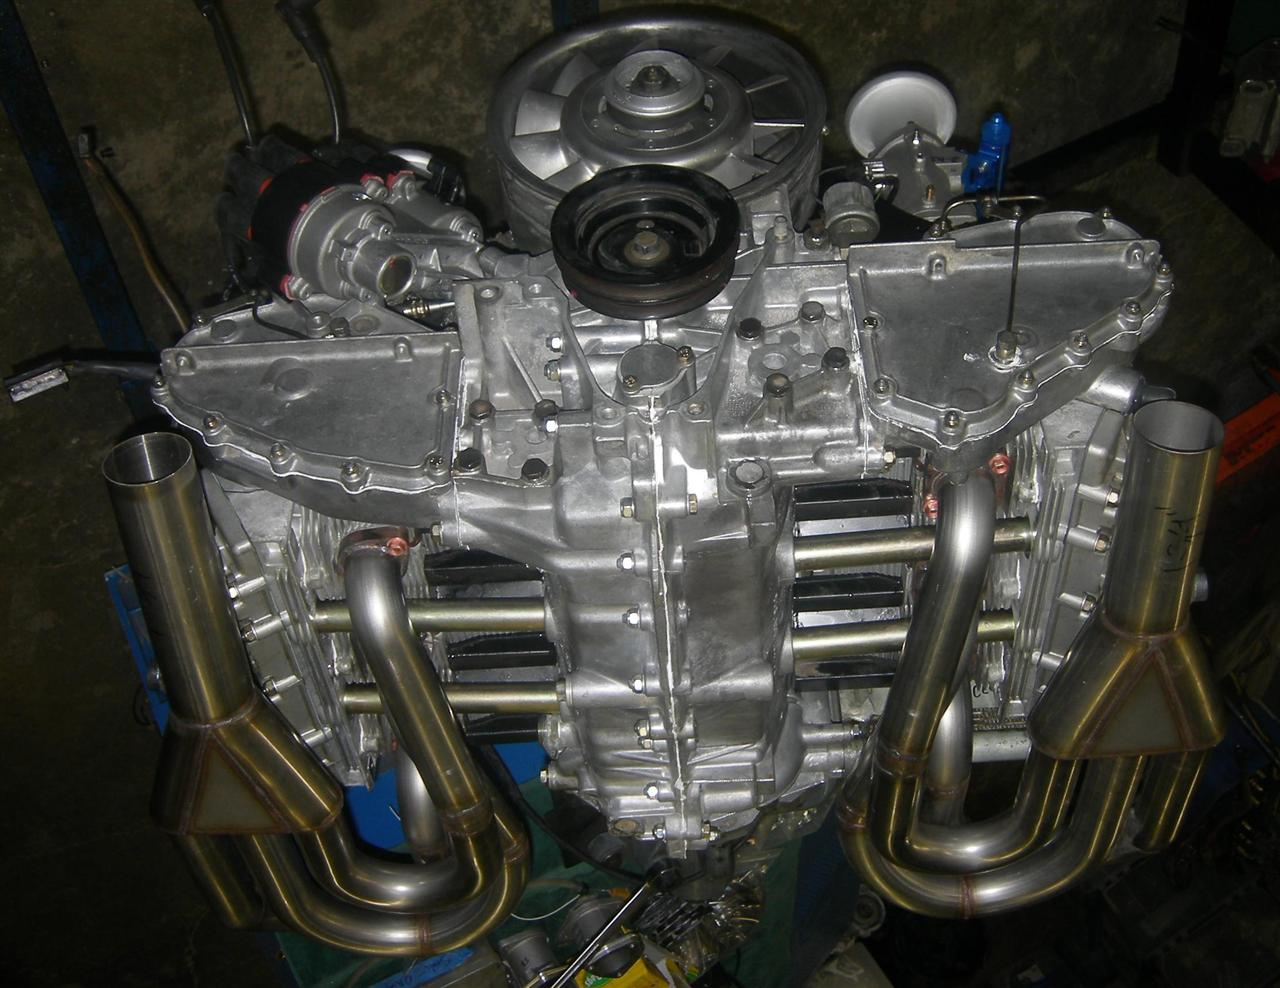 DSCN1221?w=821 pc34 build instant g 7.3 Powerstroke Diesel Crate Engine at bakdesigns.co